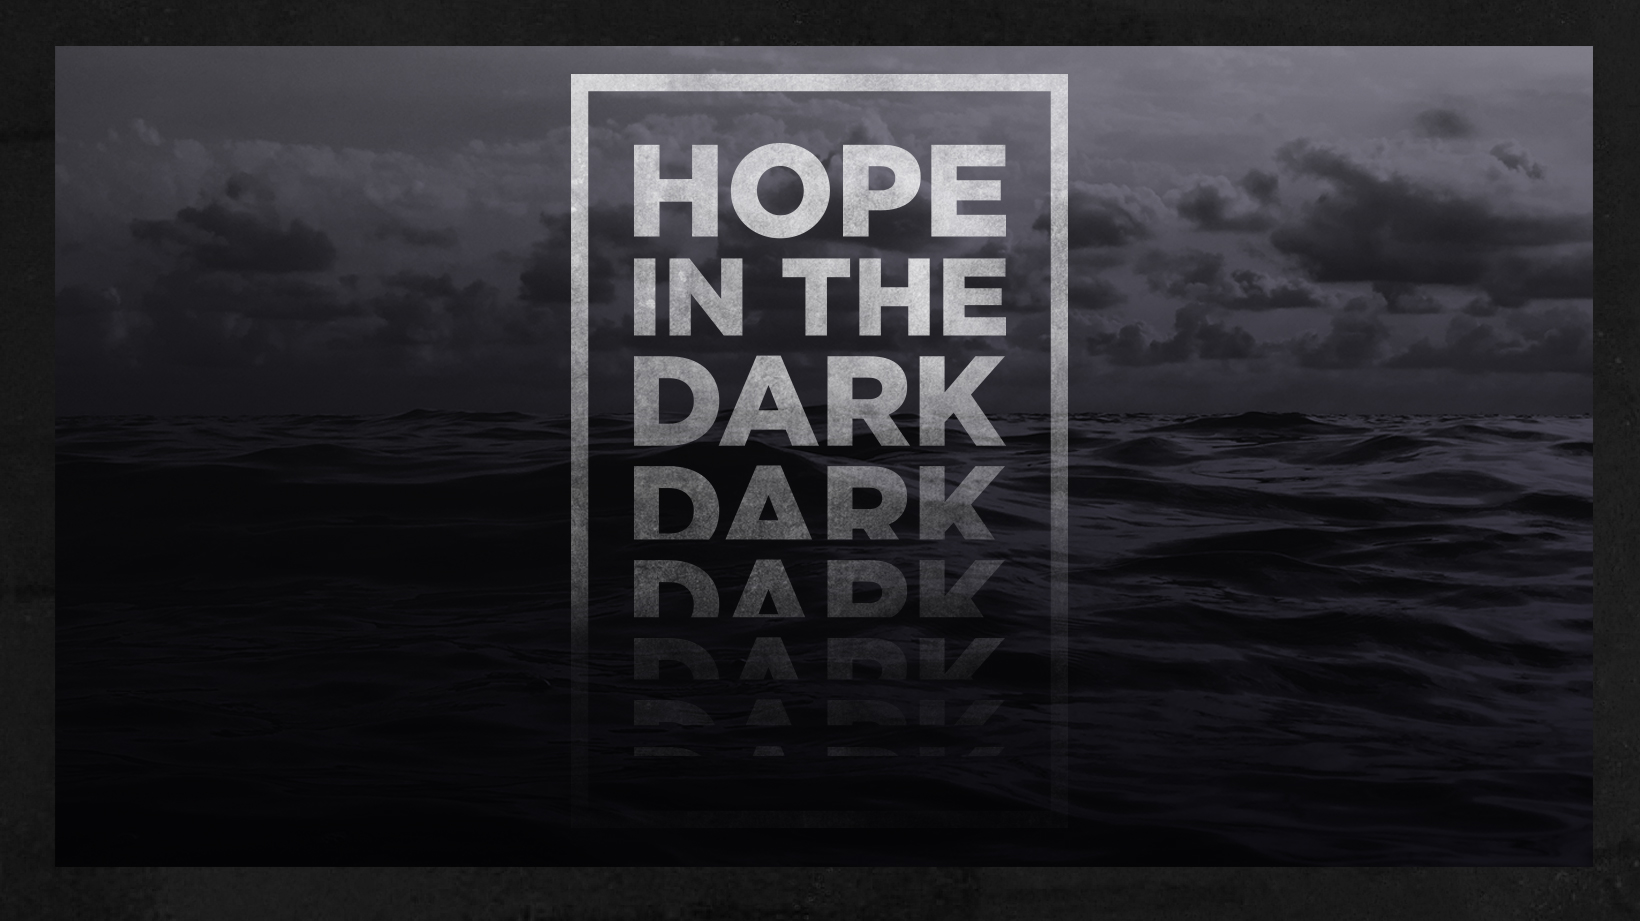 Hope in the Dark: Part 3